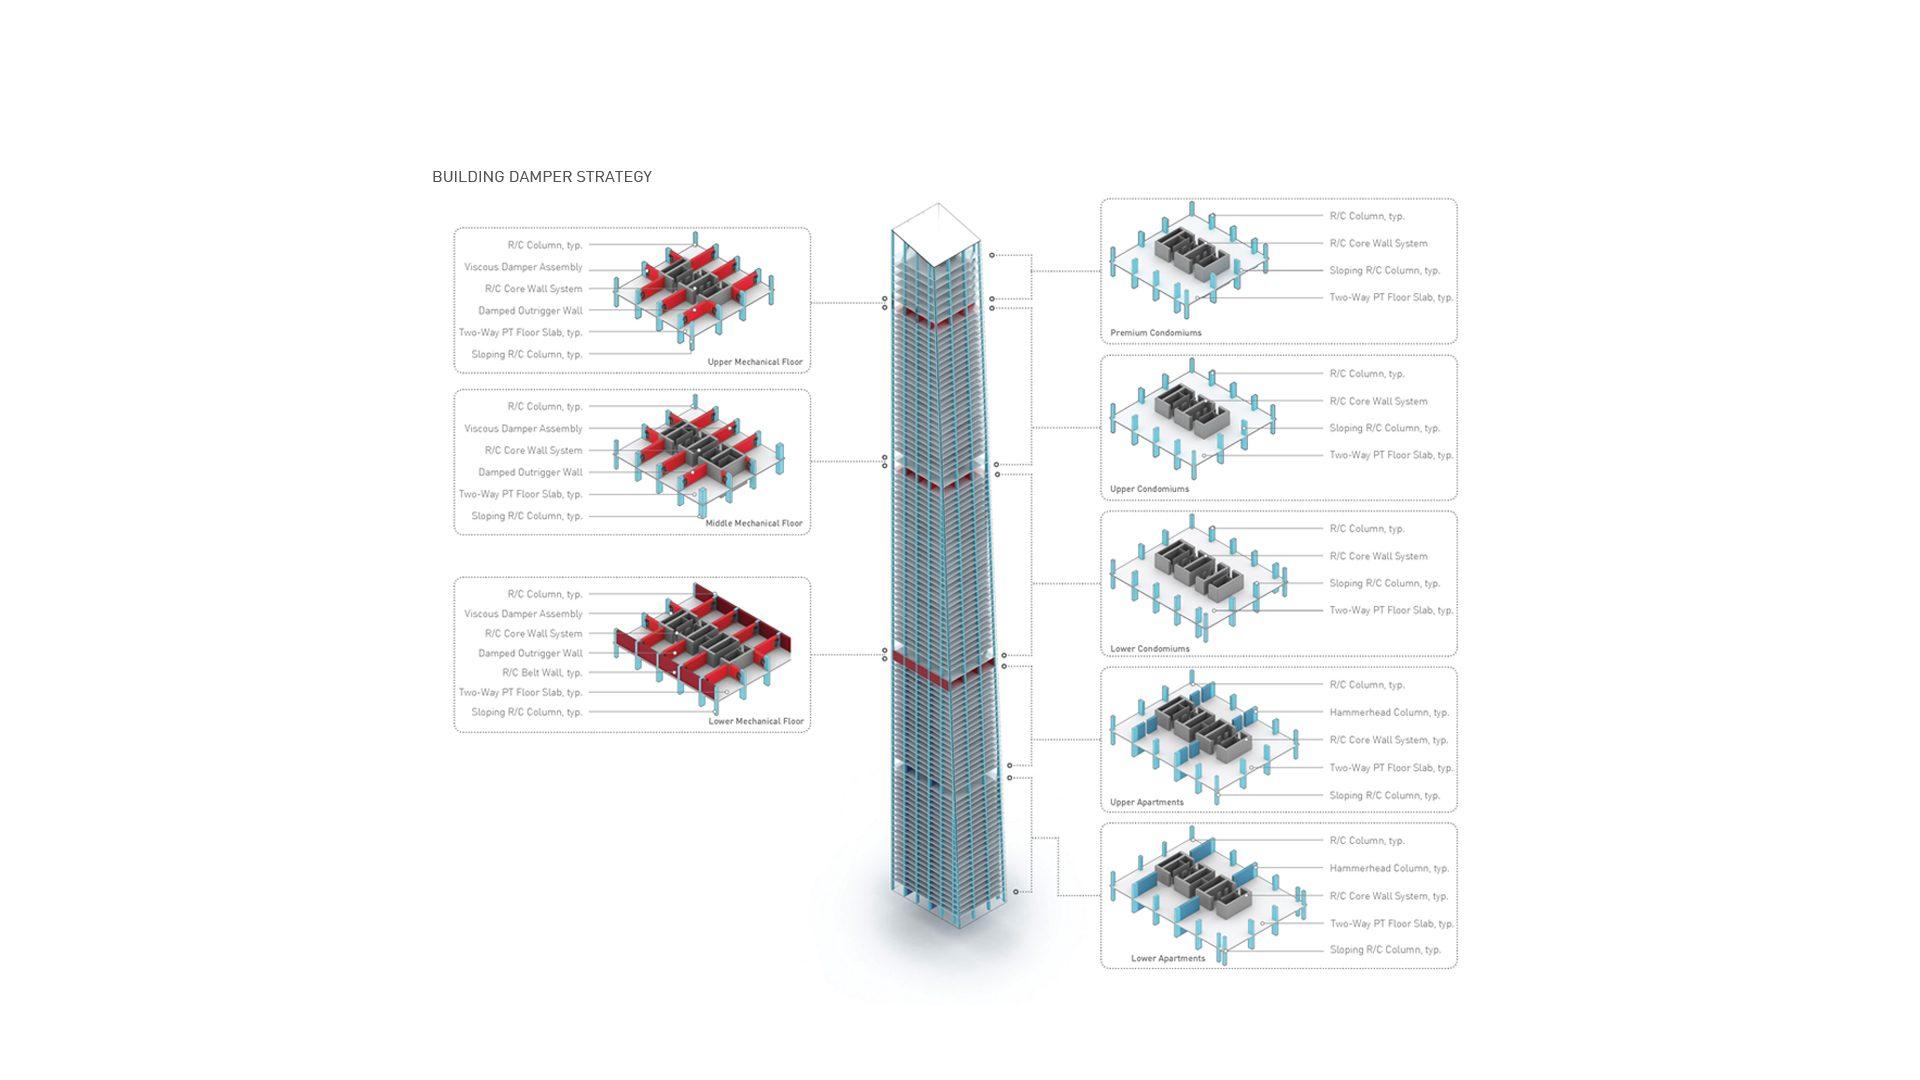 013_Building Damper Strategy